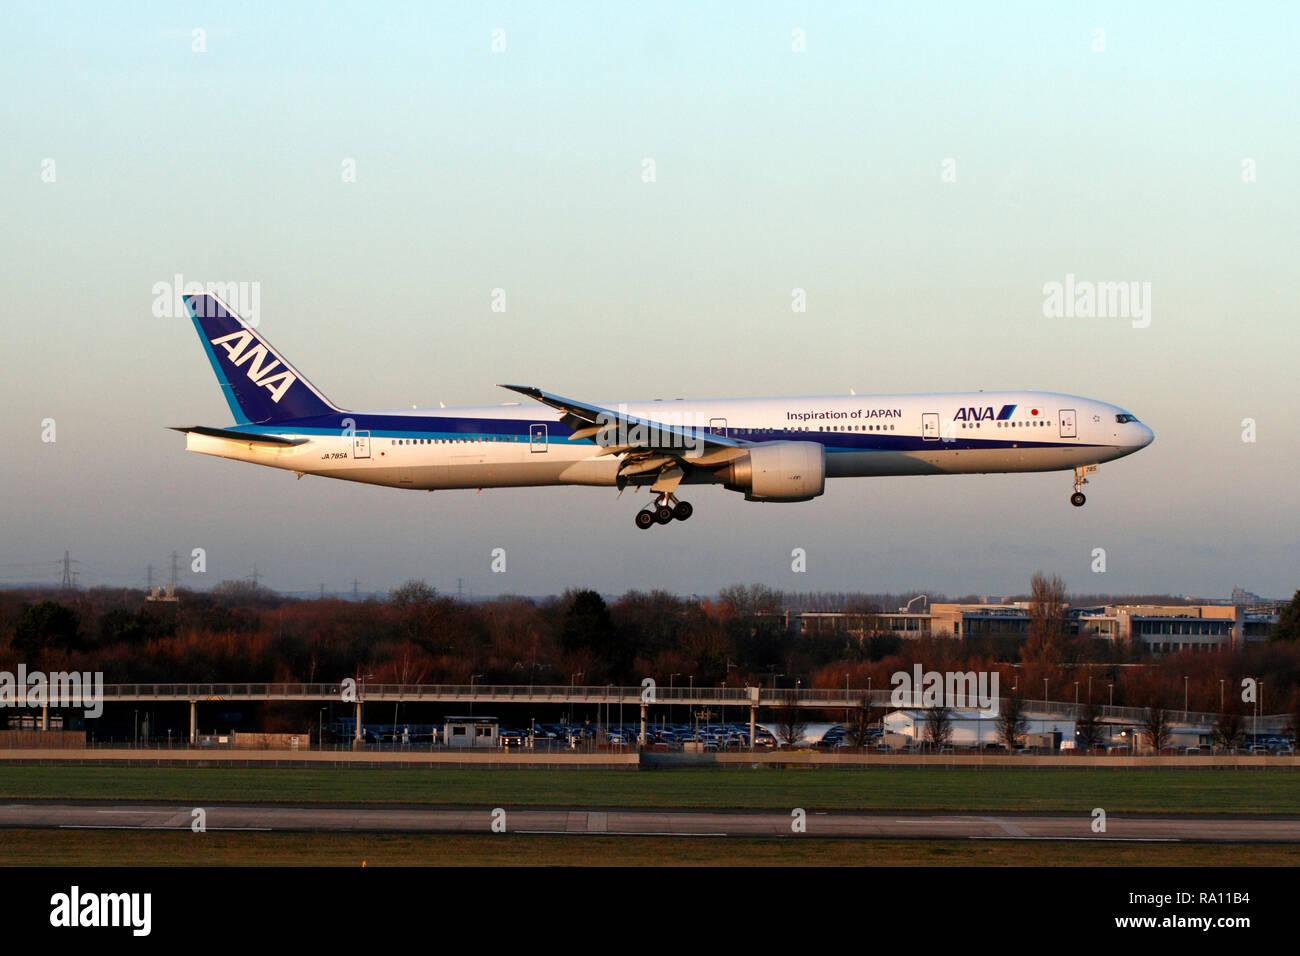 Boeing 777-300, ANA, JA785A, All Nippon Airways, landing at Heathrow, London airport terminal 5 runway. UK - Stock Image